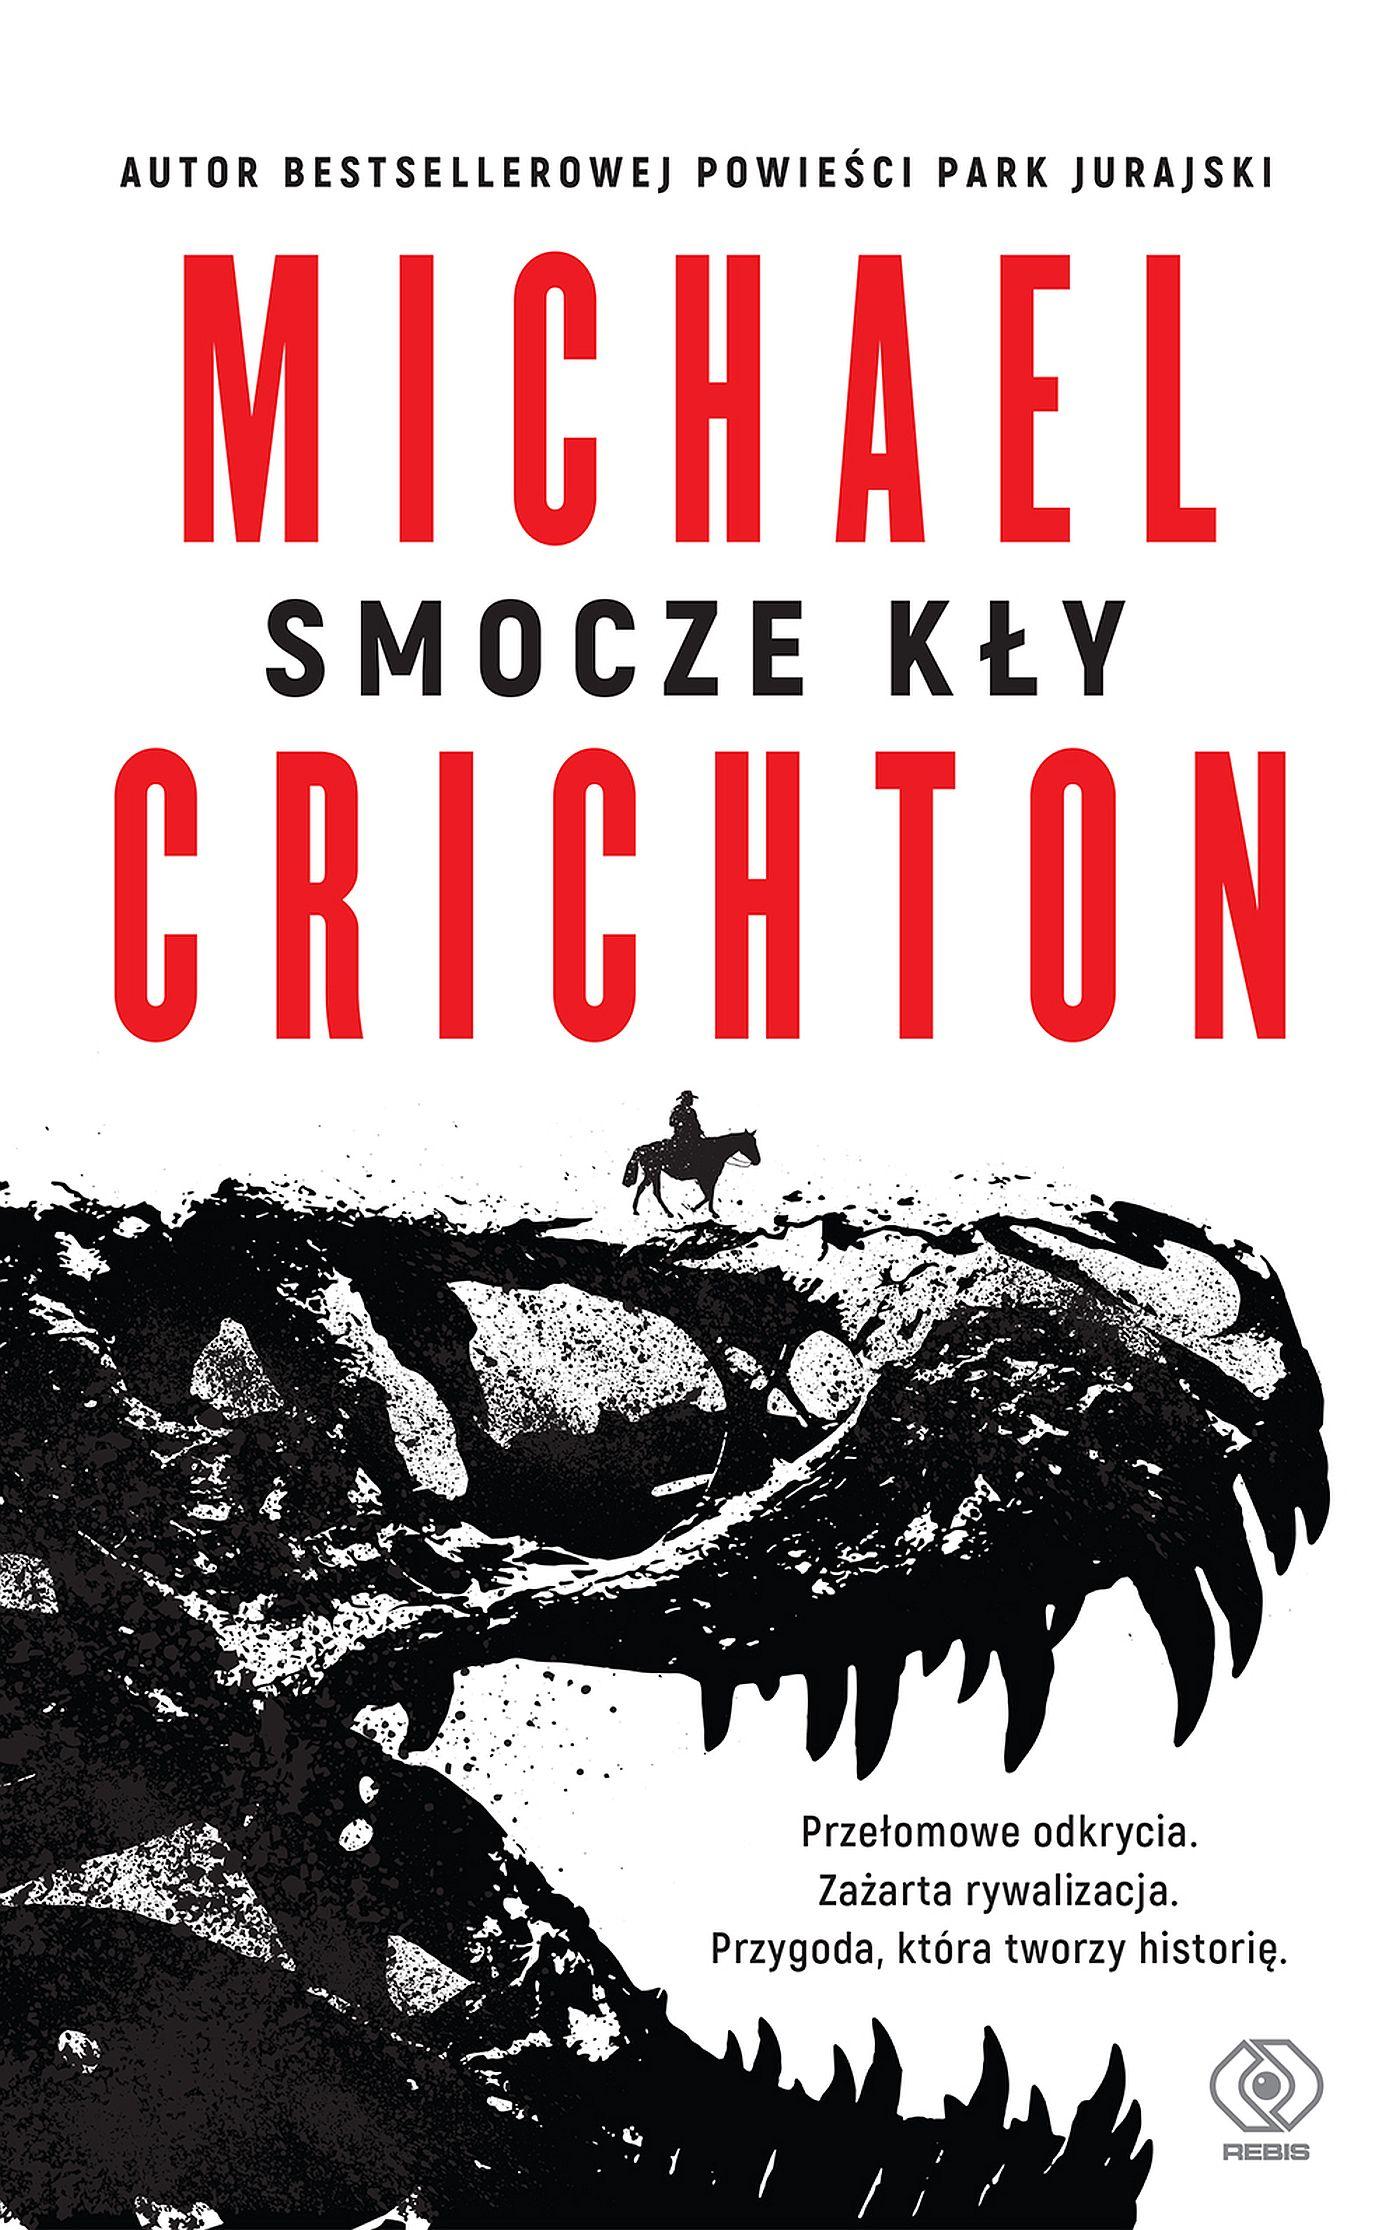 Michael Crichton Smocze kły michael crichton sphere